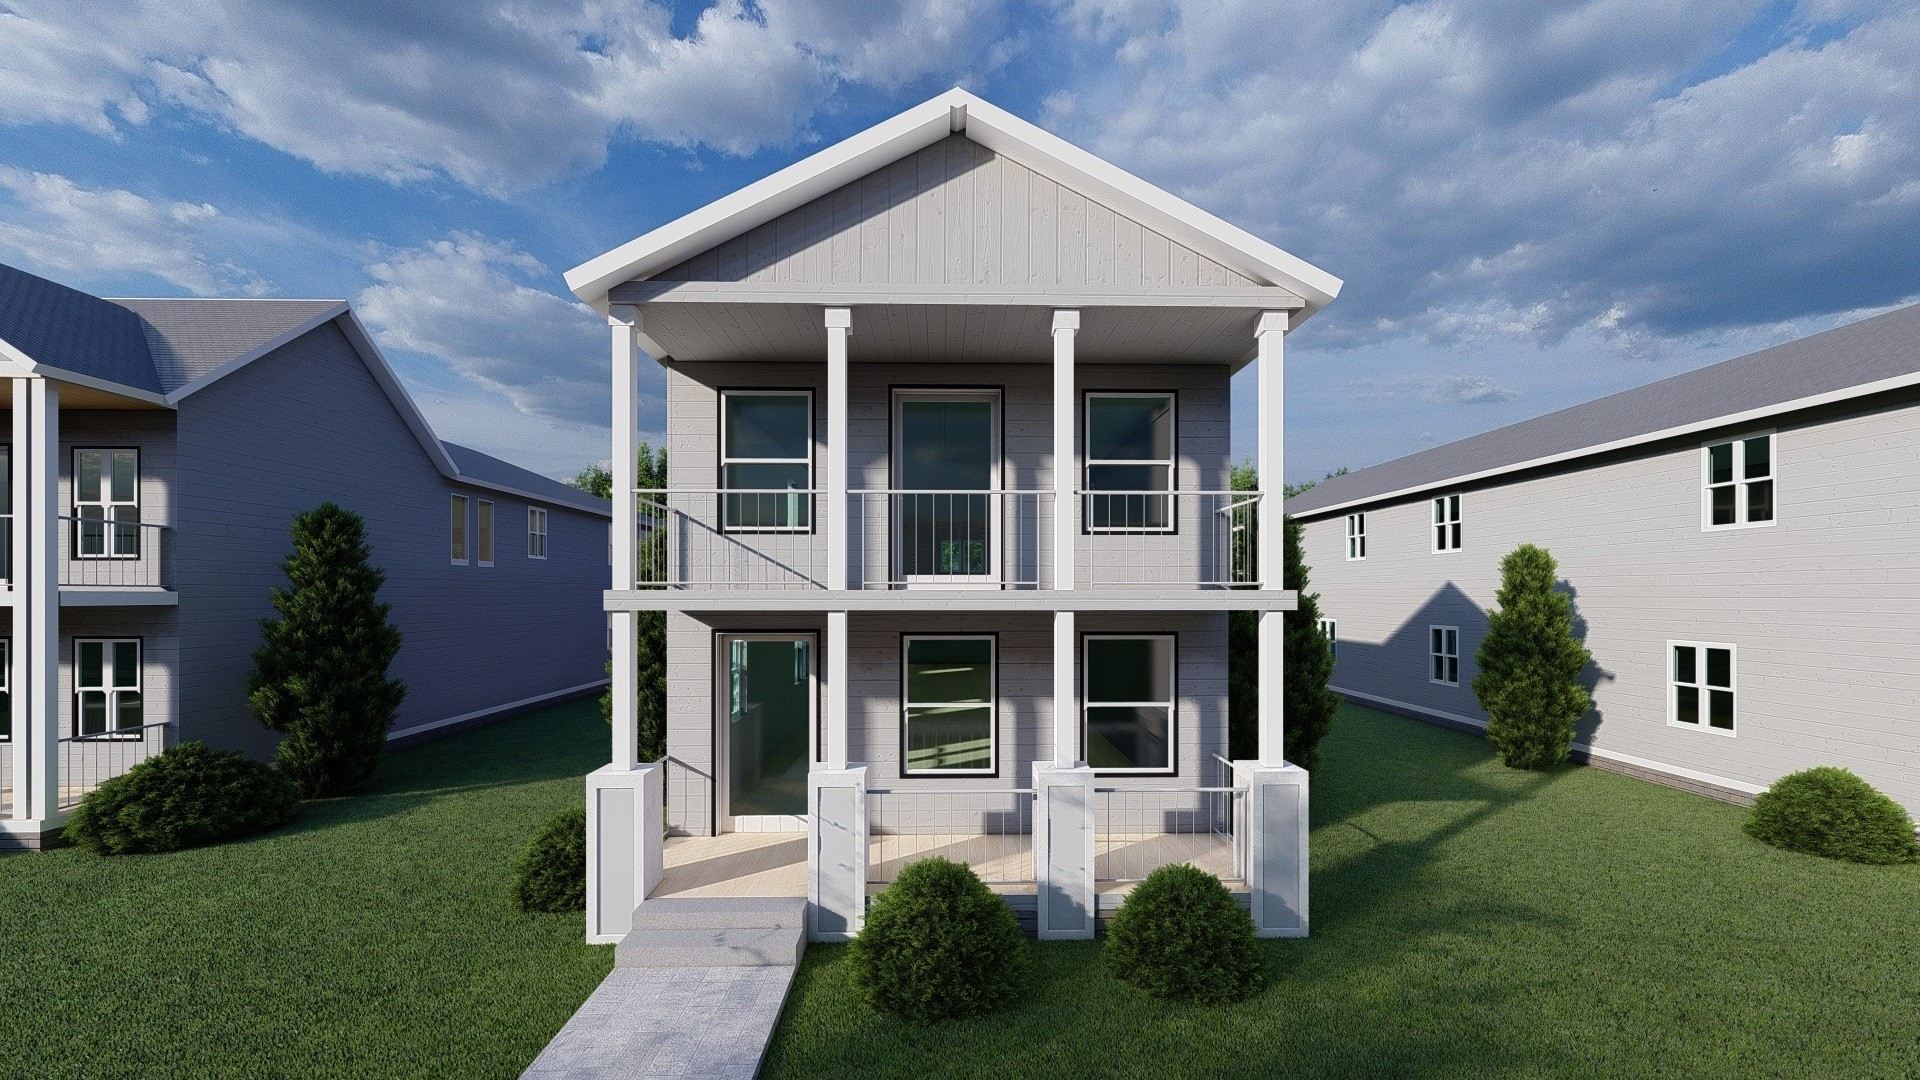 6102 New York Ave Unit B Property Photo - Nashville, TN real estate listing